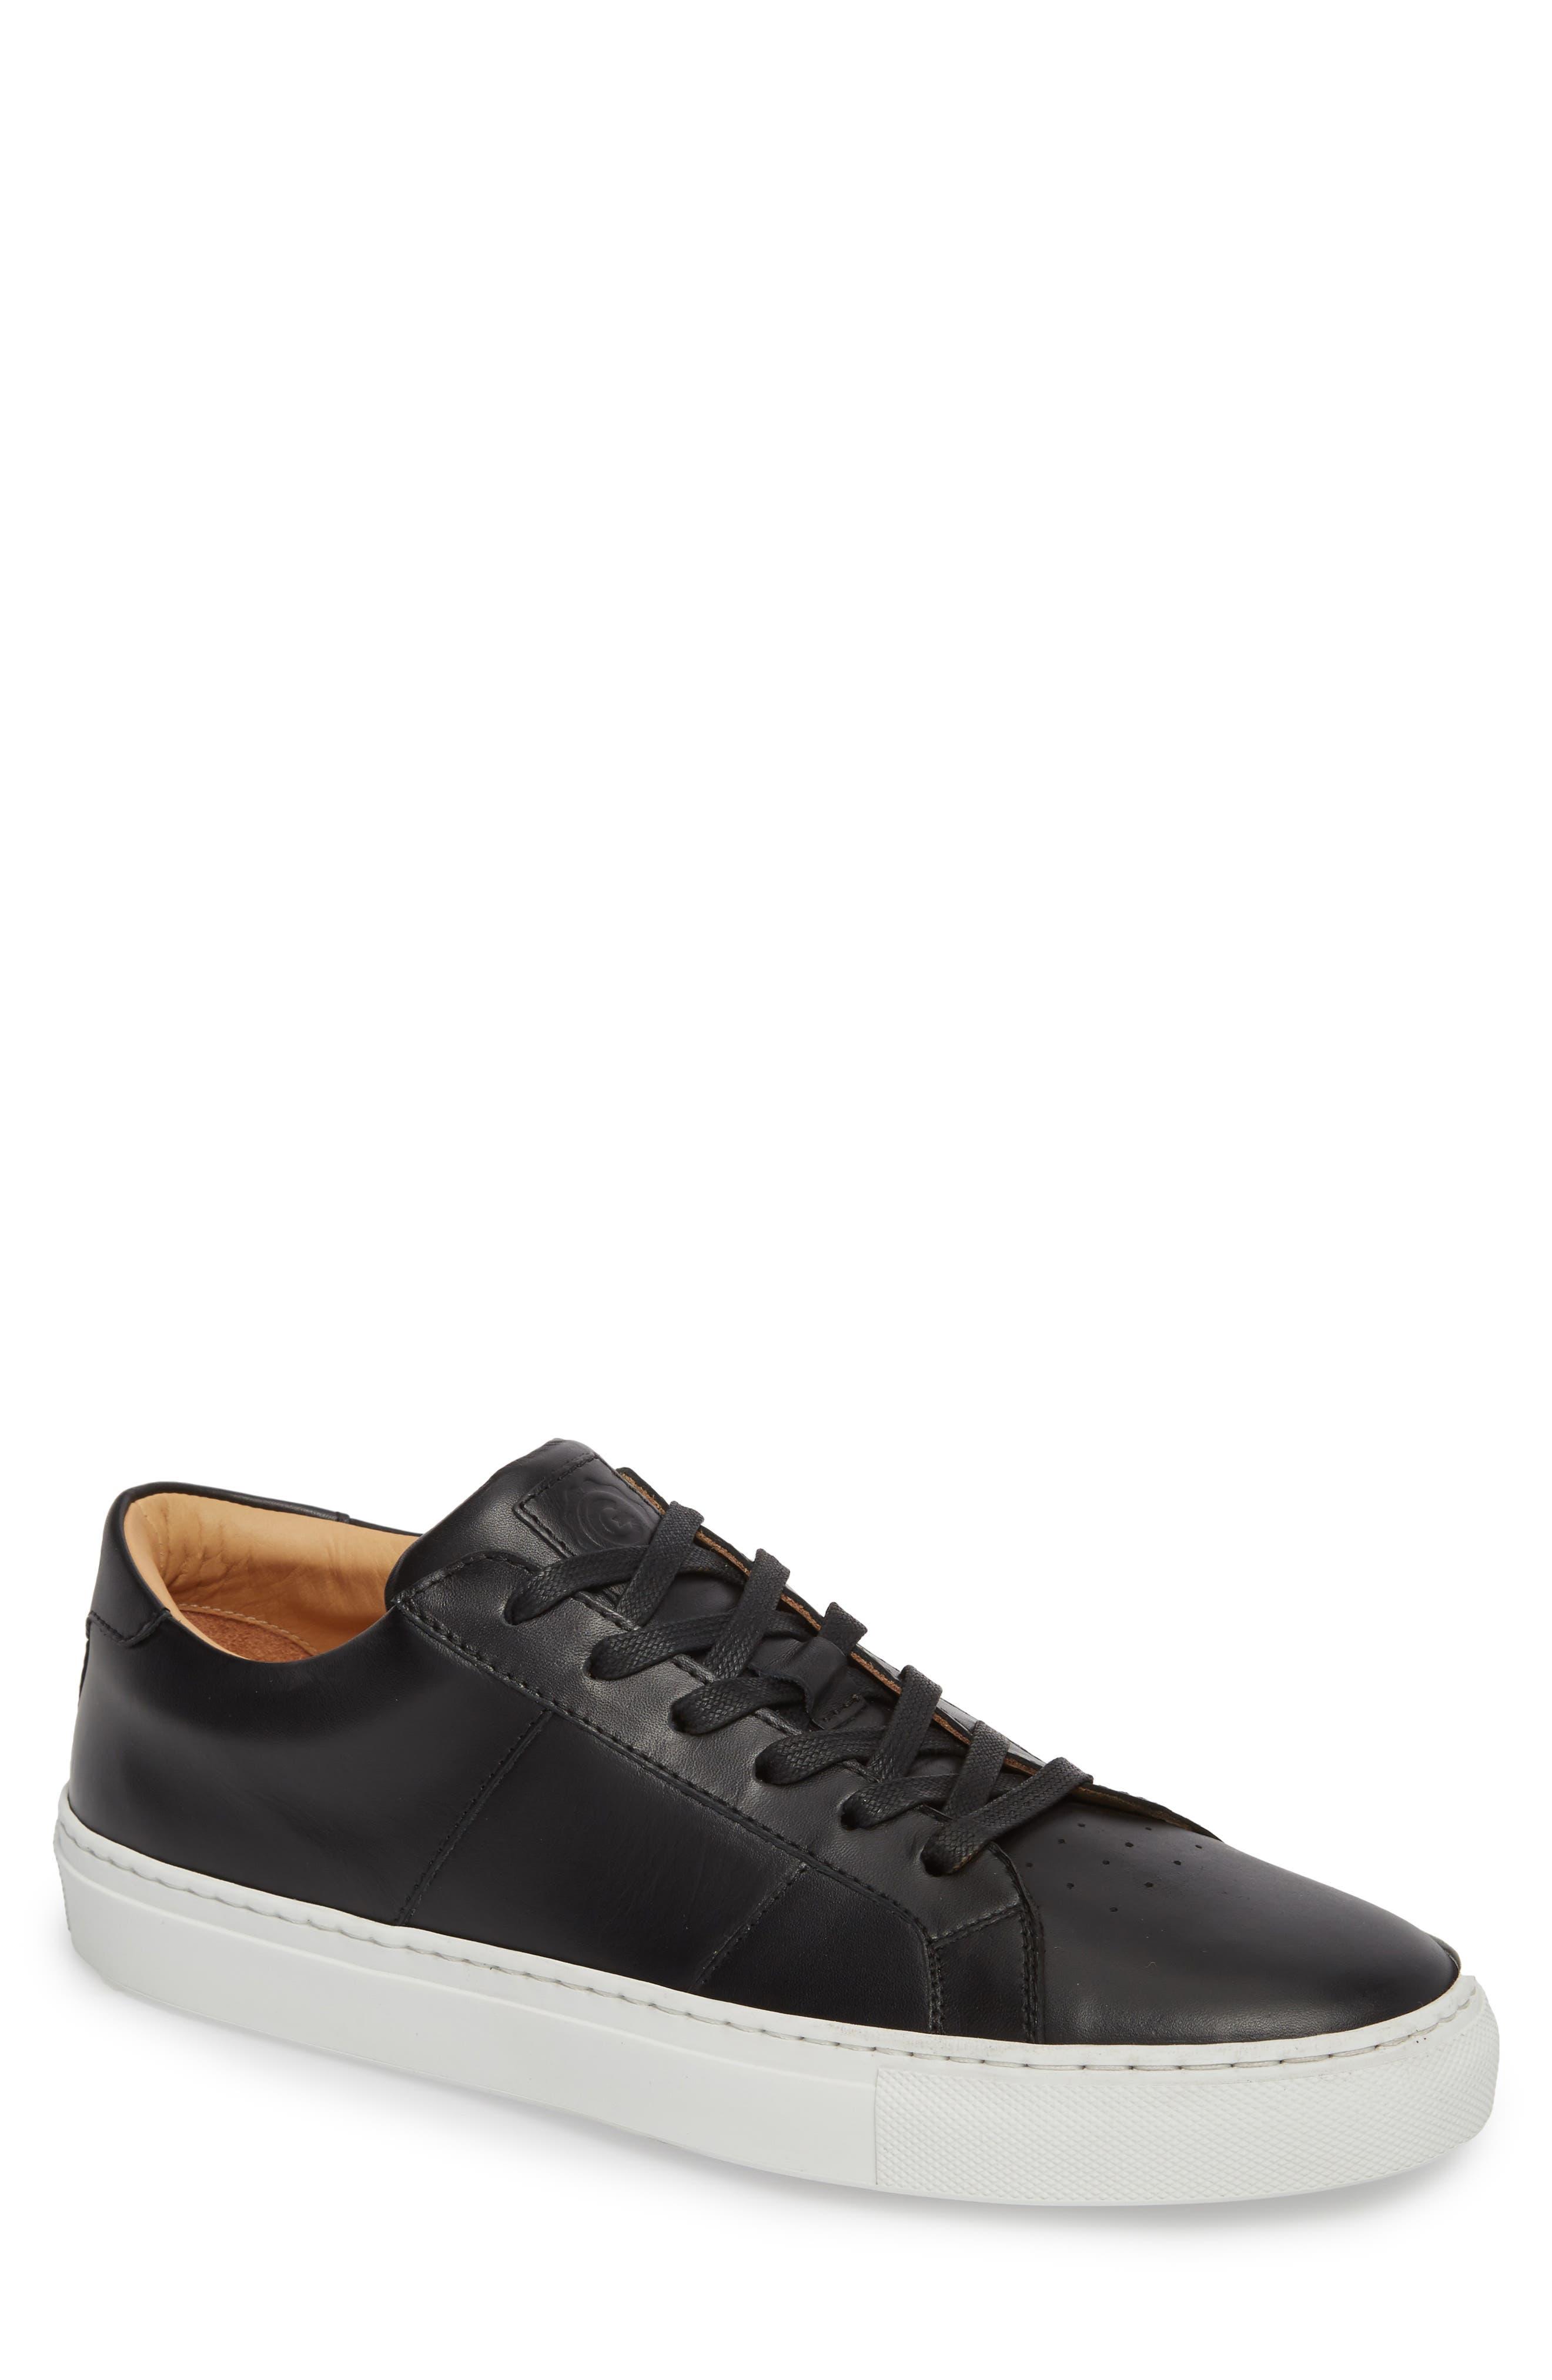 GREATS, Royale Sneaker, Main thumbnail 1, color, 001